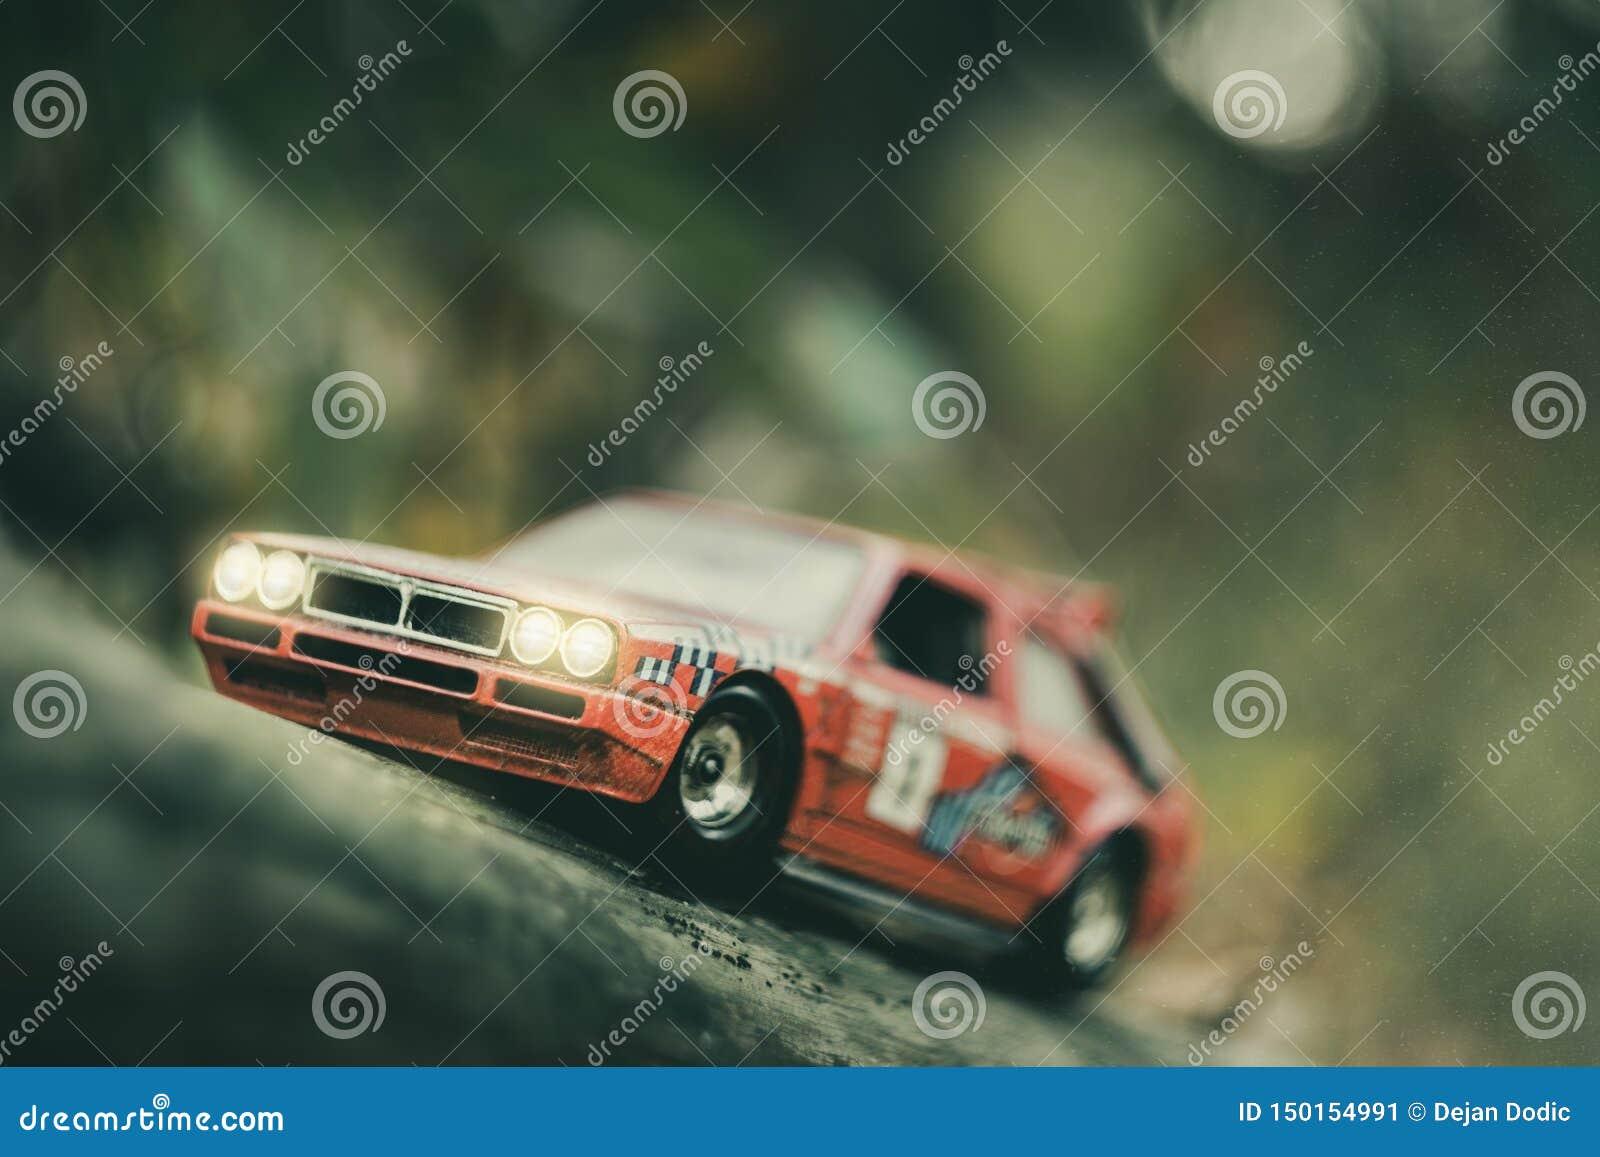 Toy retro rally car model